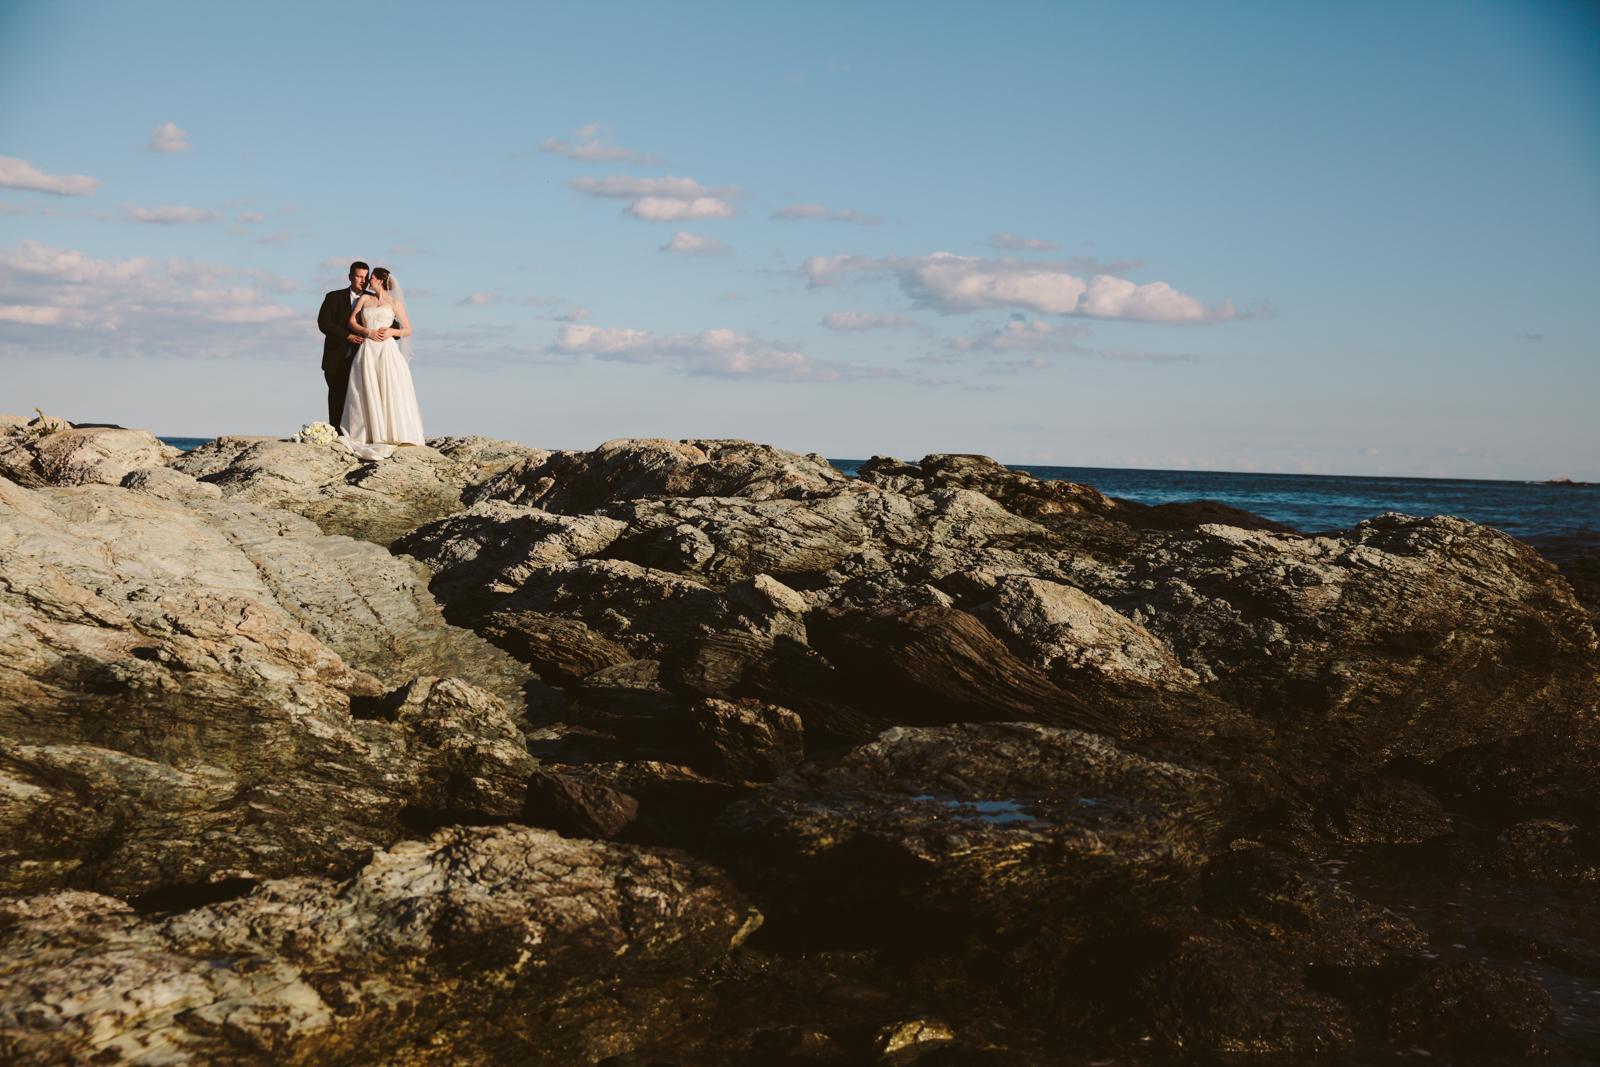 Eastons-Beach-Rotunda-Ballroom-Wedding-Newport-Rhode-Island-PhotographybyAmandaMorgan-70.jpg